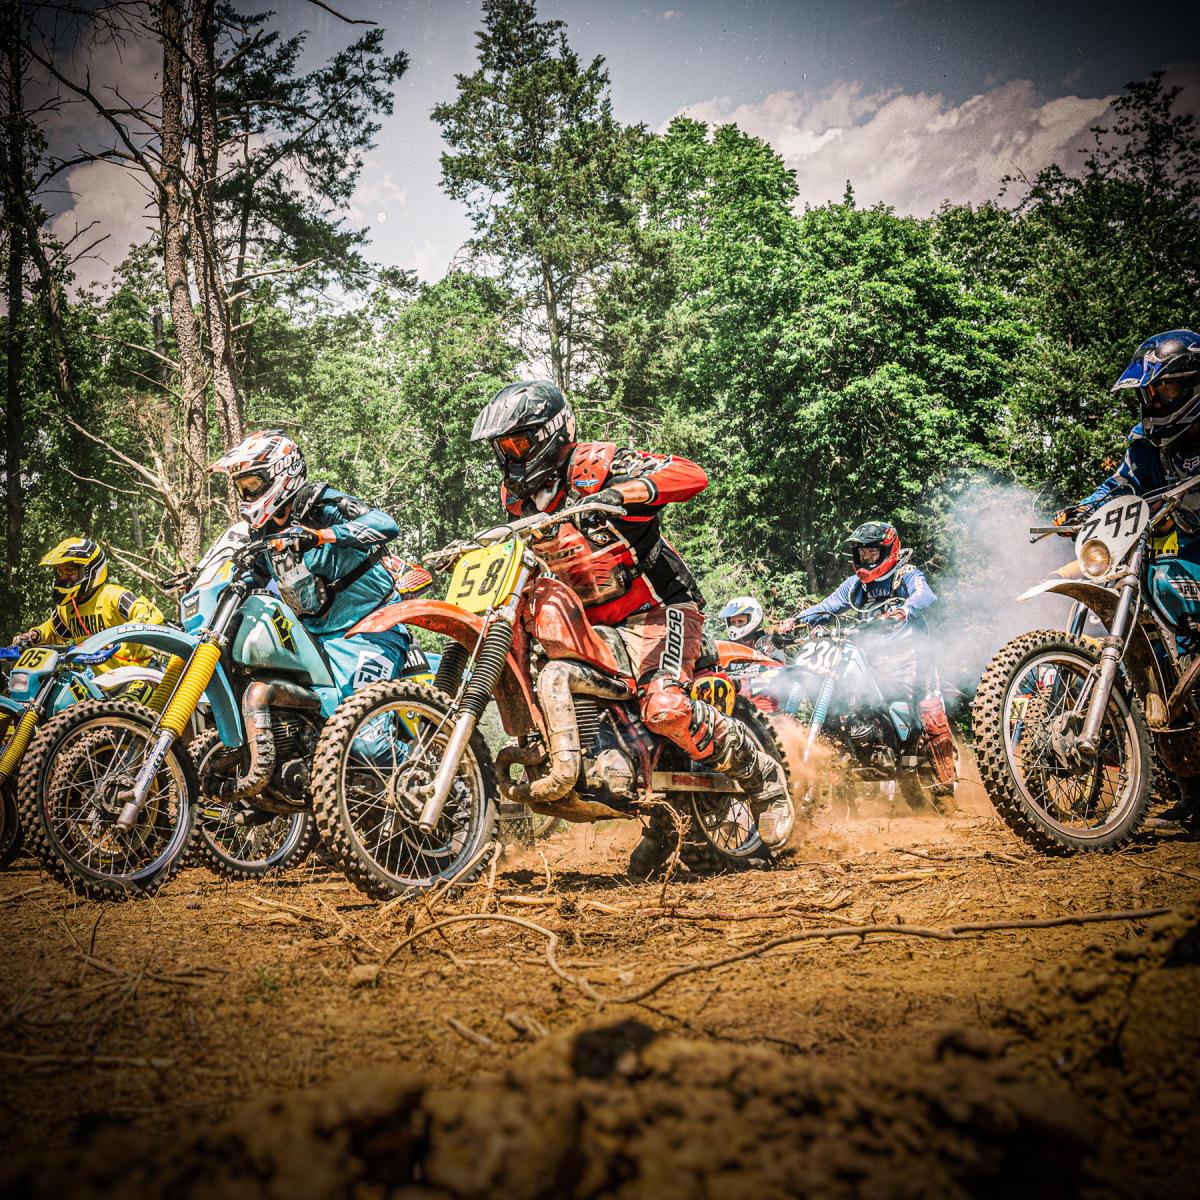 AHRMA Classic MotoFest - Dirt Track Bikes | Topeka, KS